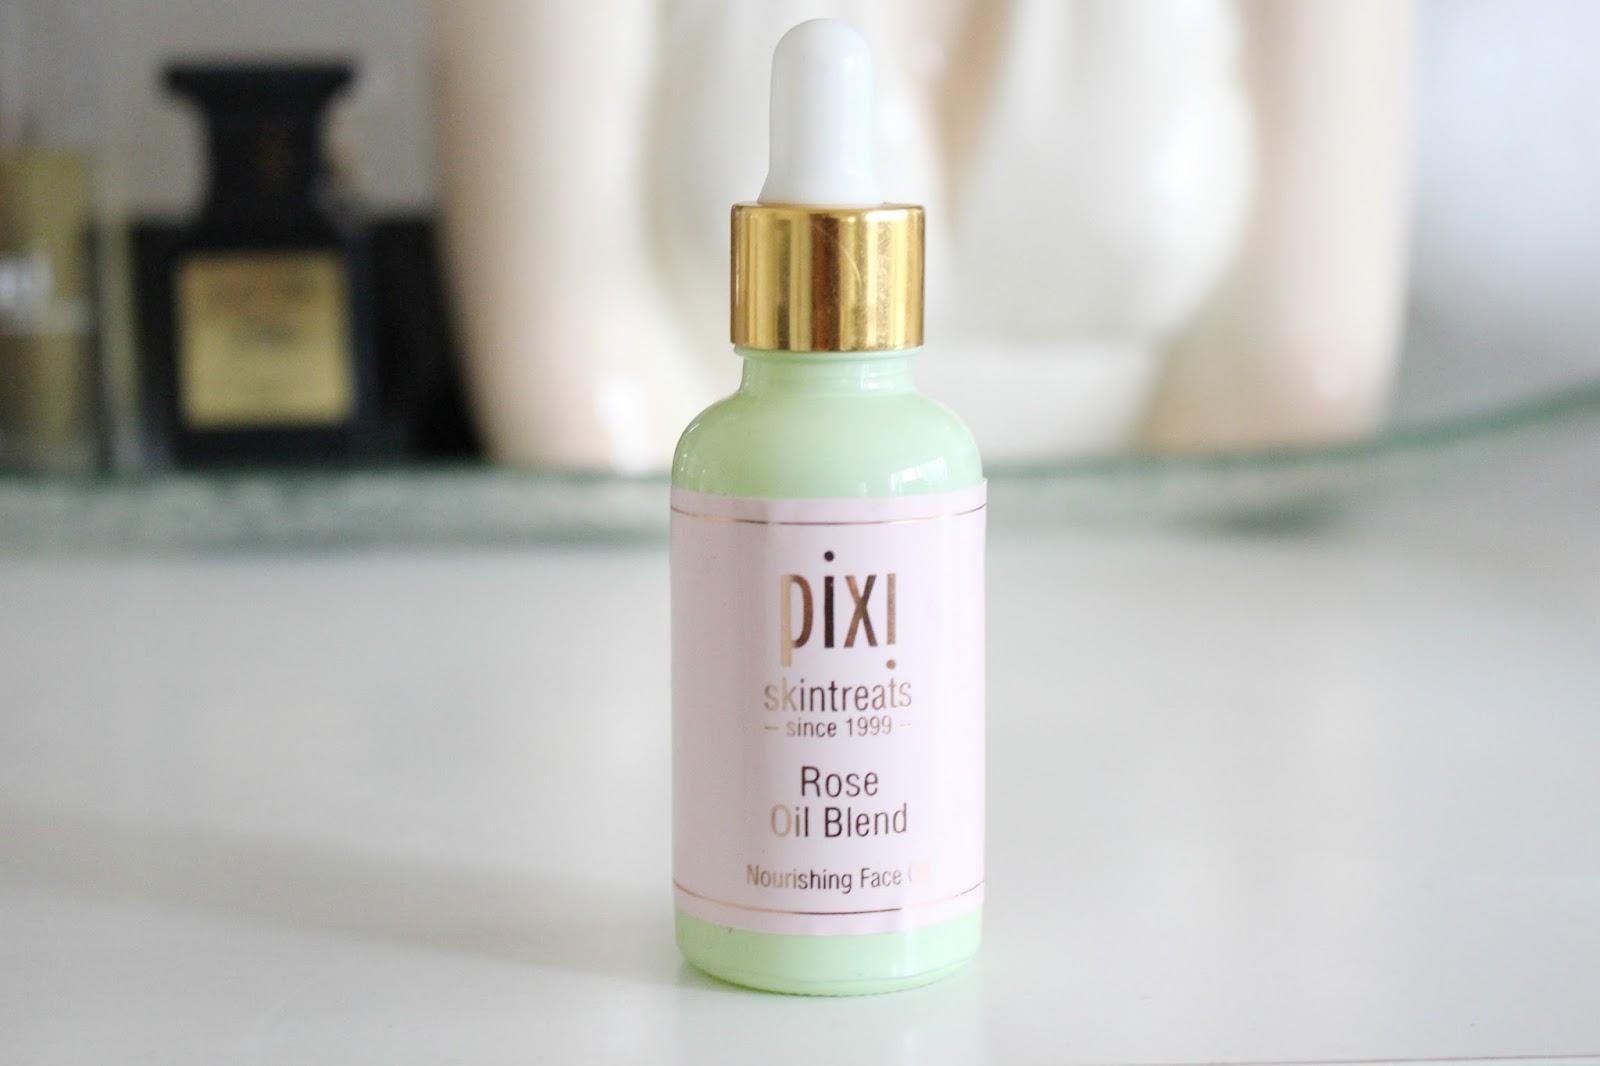 beauty oils for combination skin, facial oils for combination skin, pix rose oil blend